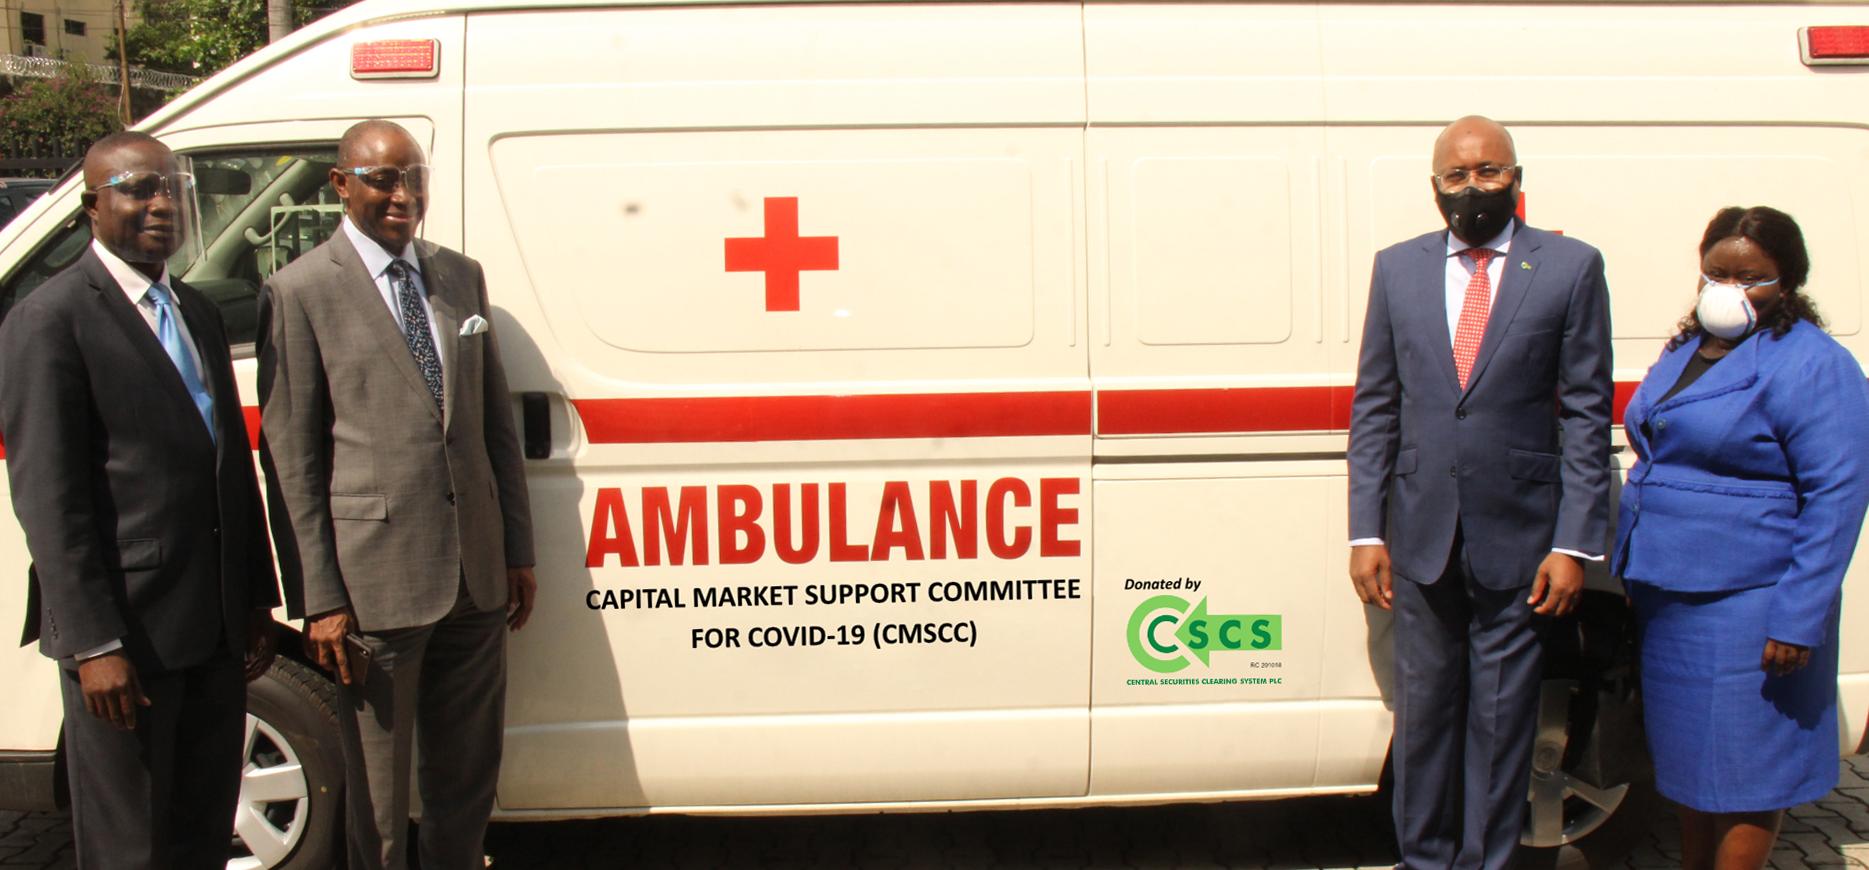 CSCS Ambulance Presentation to CMSCC